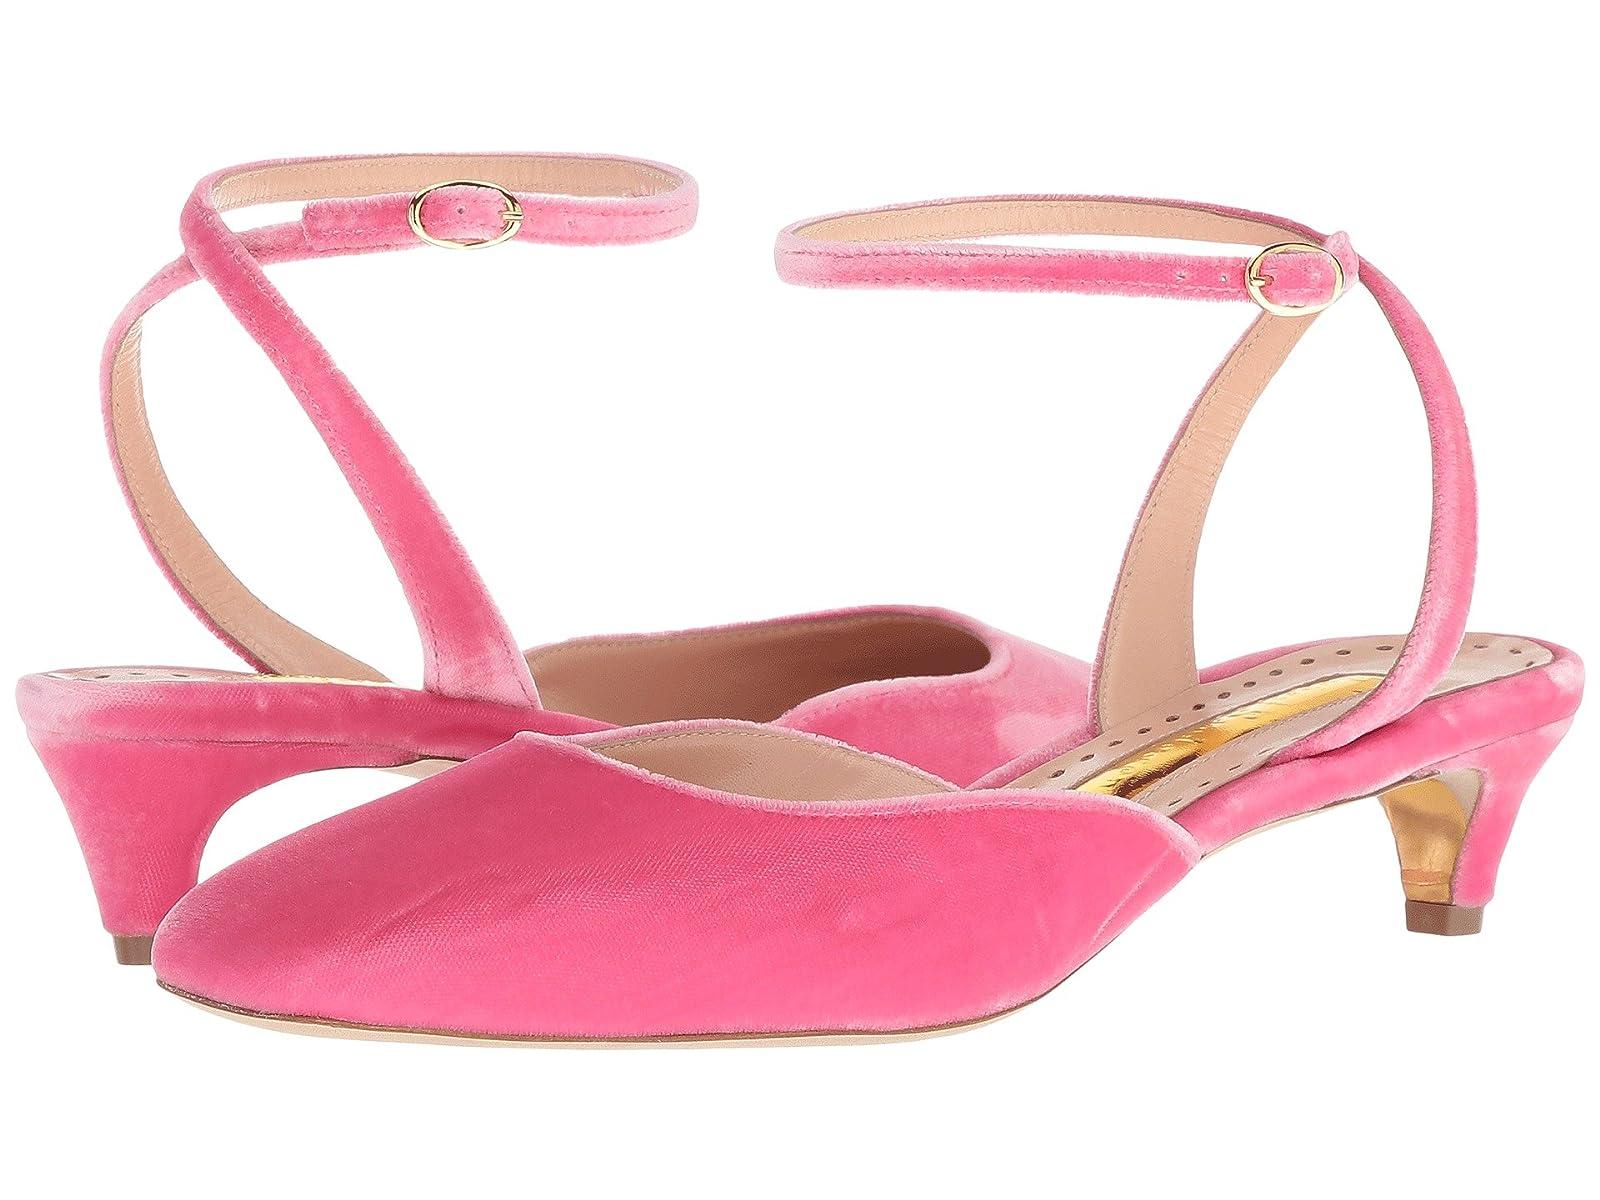 Rupert Sanderson CorneliaAtmospheric grades have affordable shoes